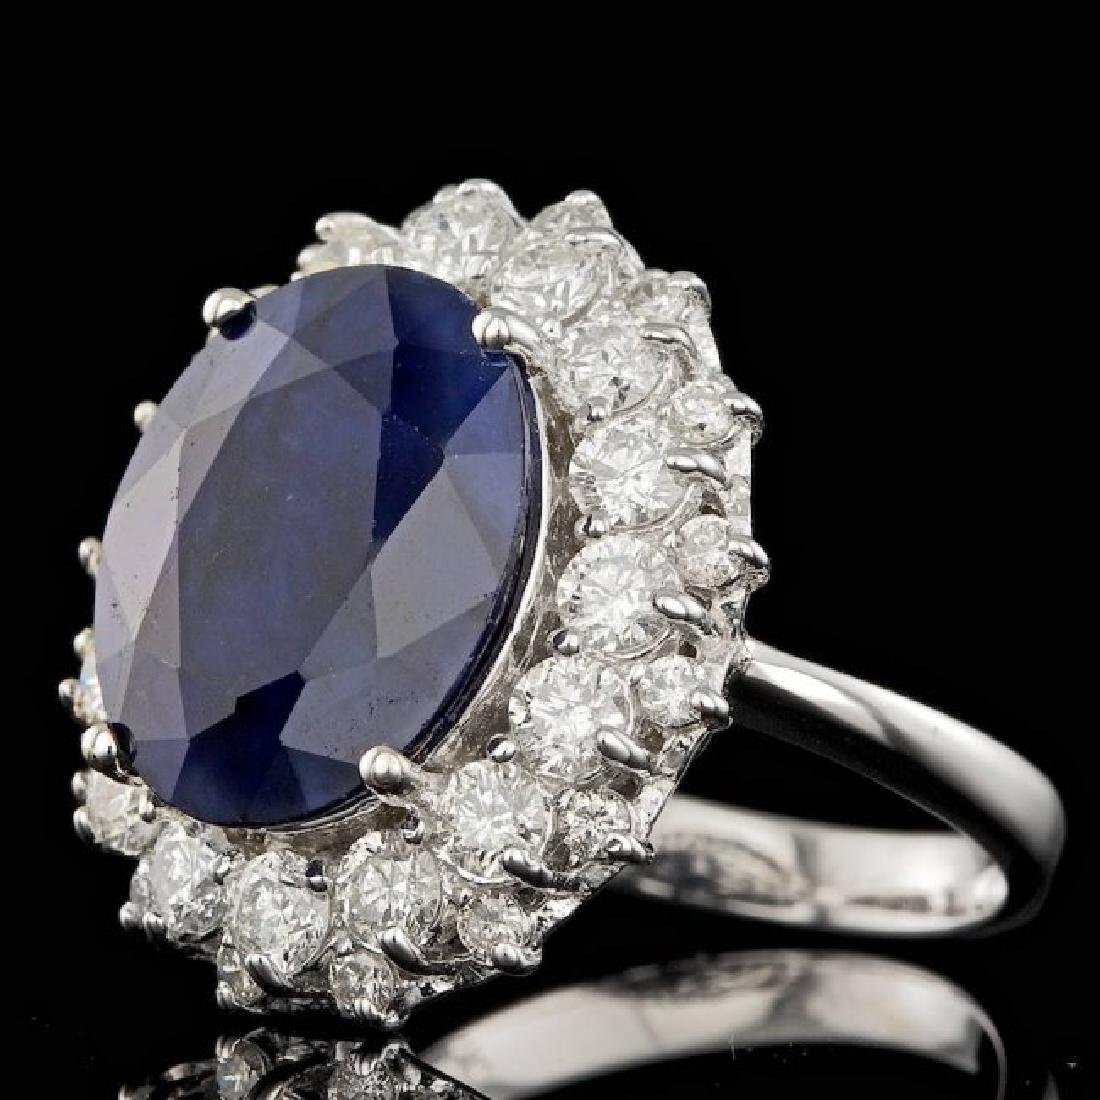 14k Gold 7.50ct Sapphire 1.75ct Diamond Ring - 2